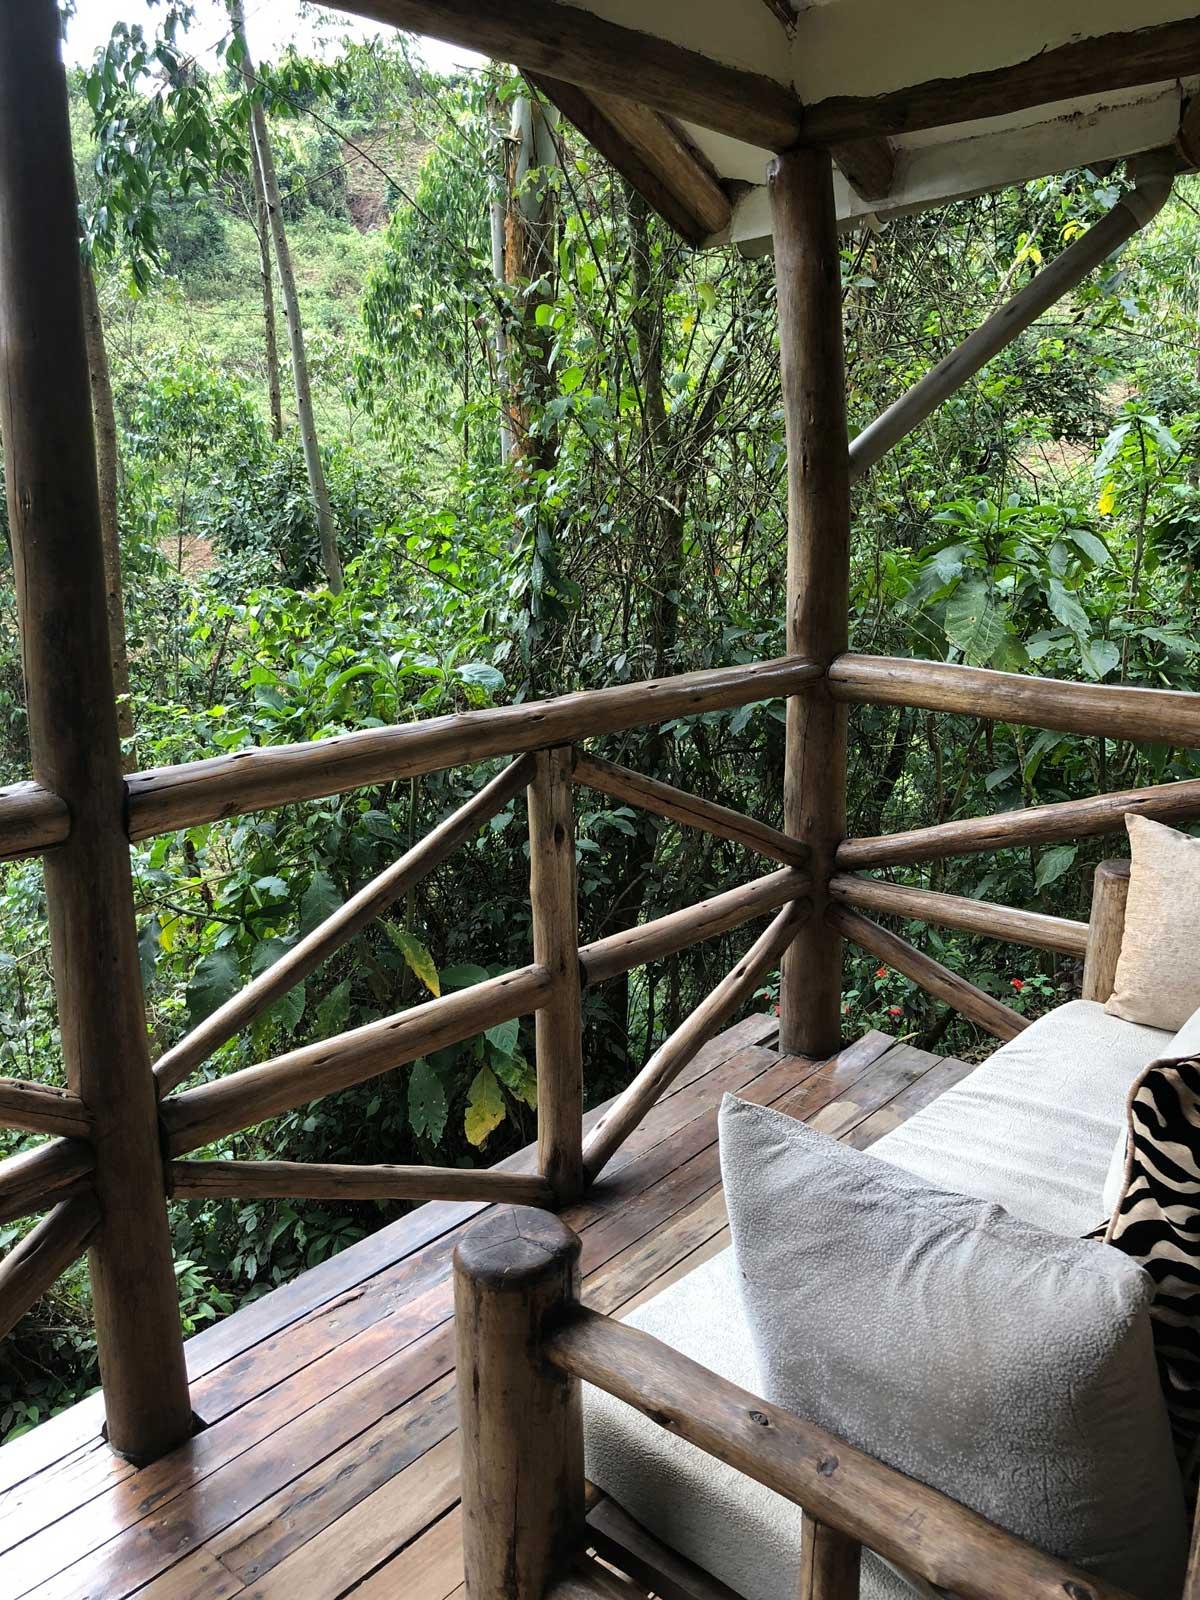 Gorilla Safari Lodge in Uganda